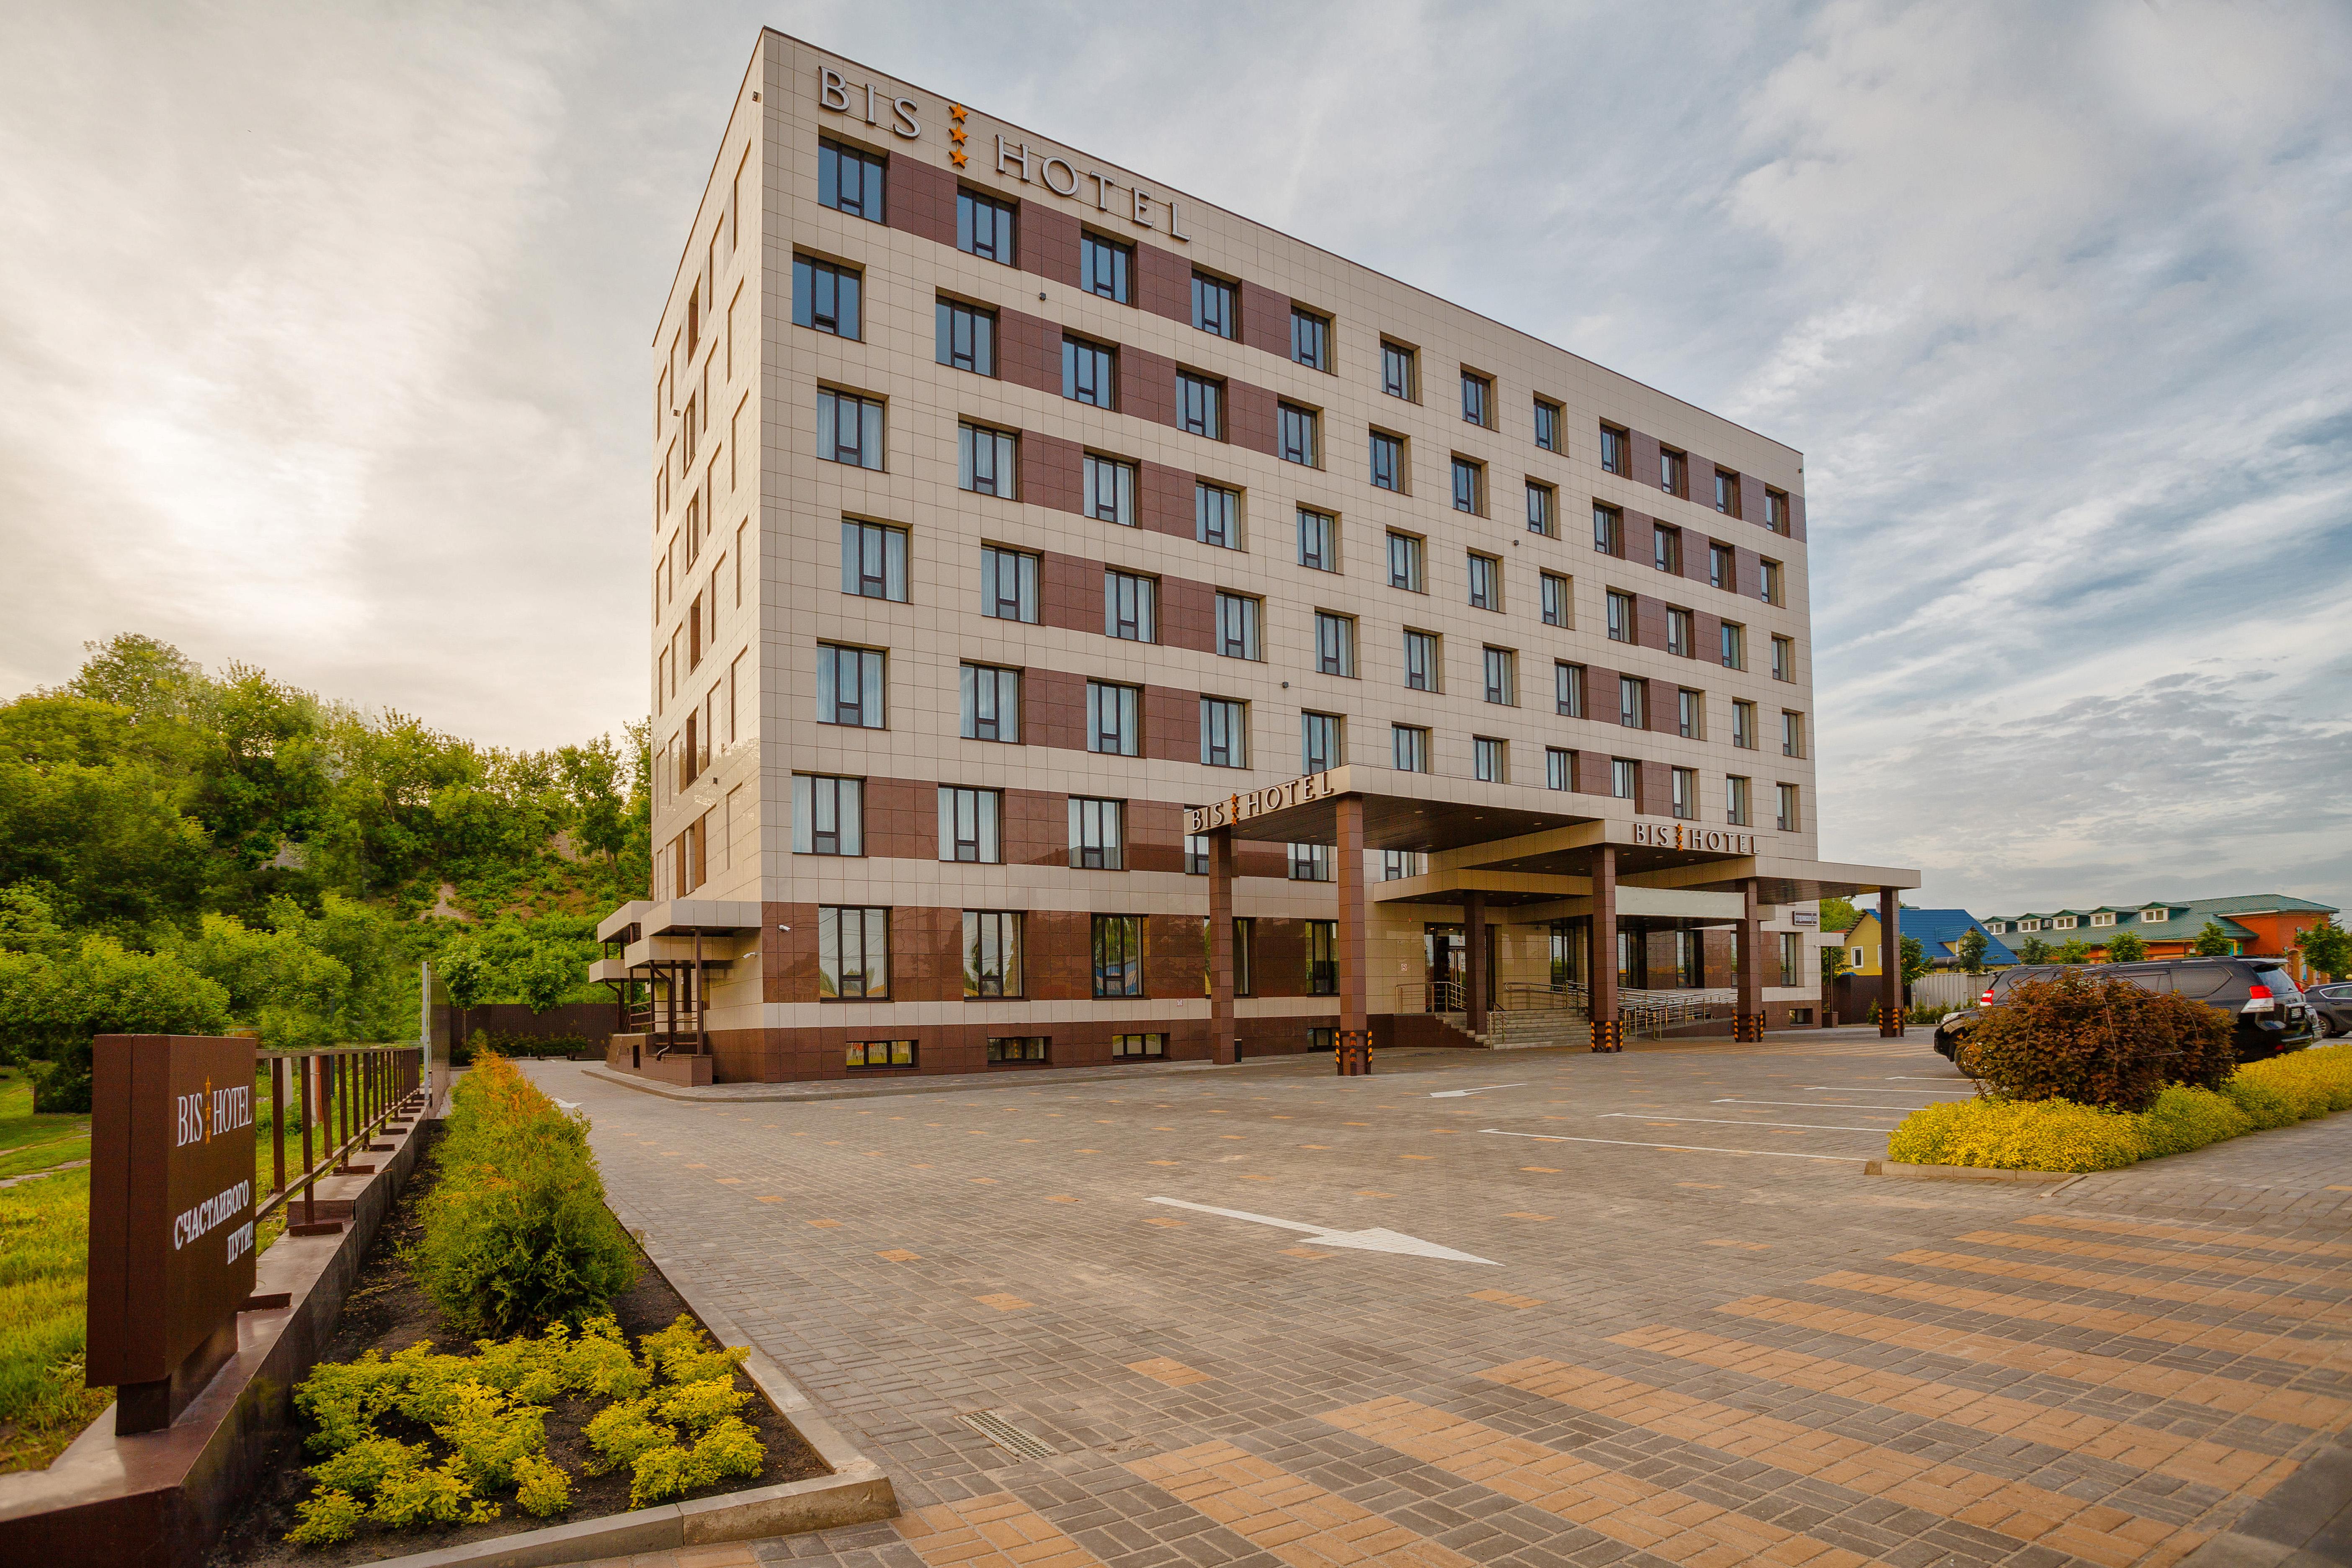 Bis Hotel Lipetsk, Lipetsk